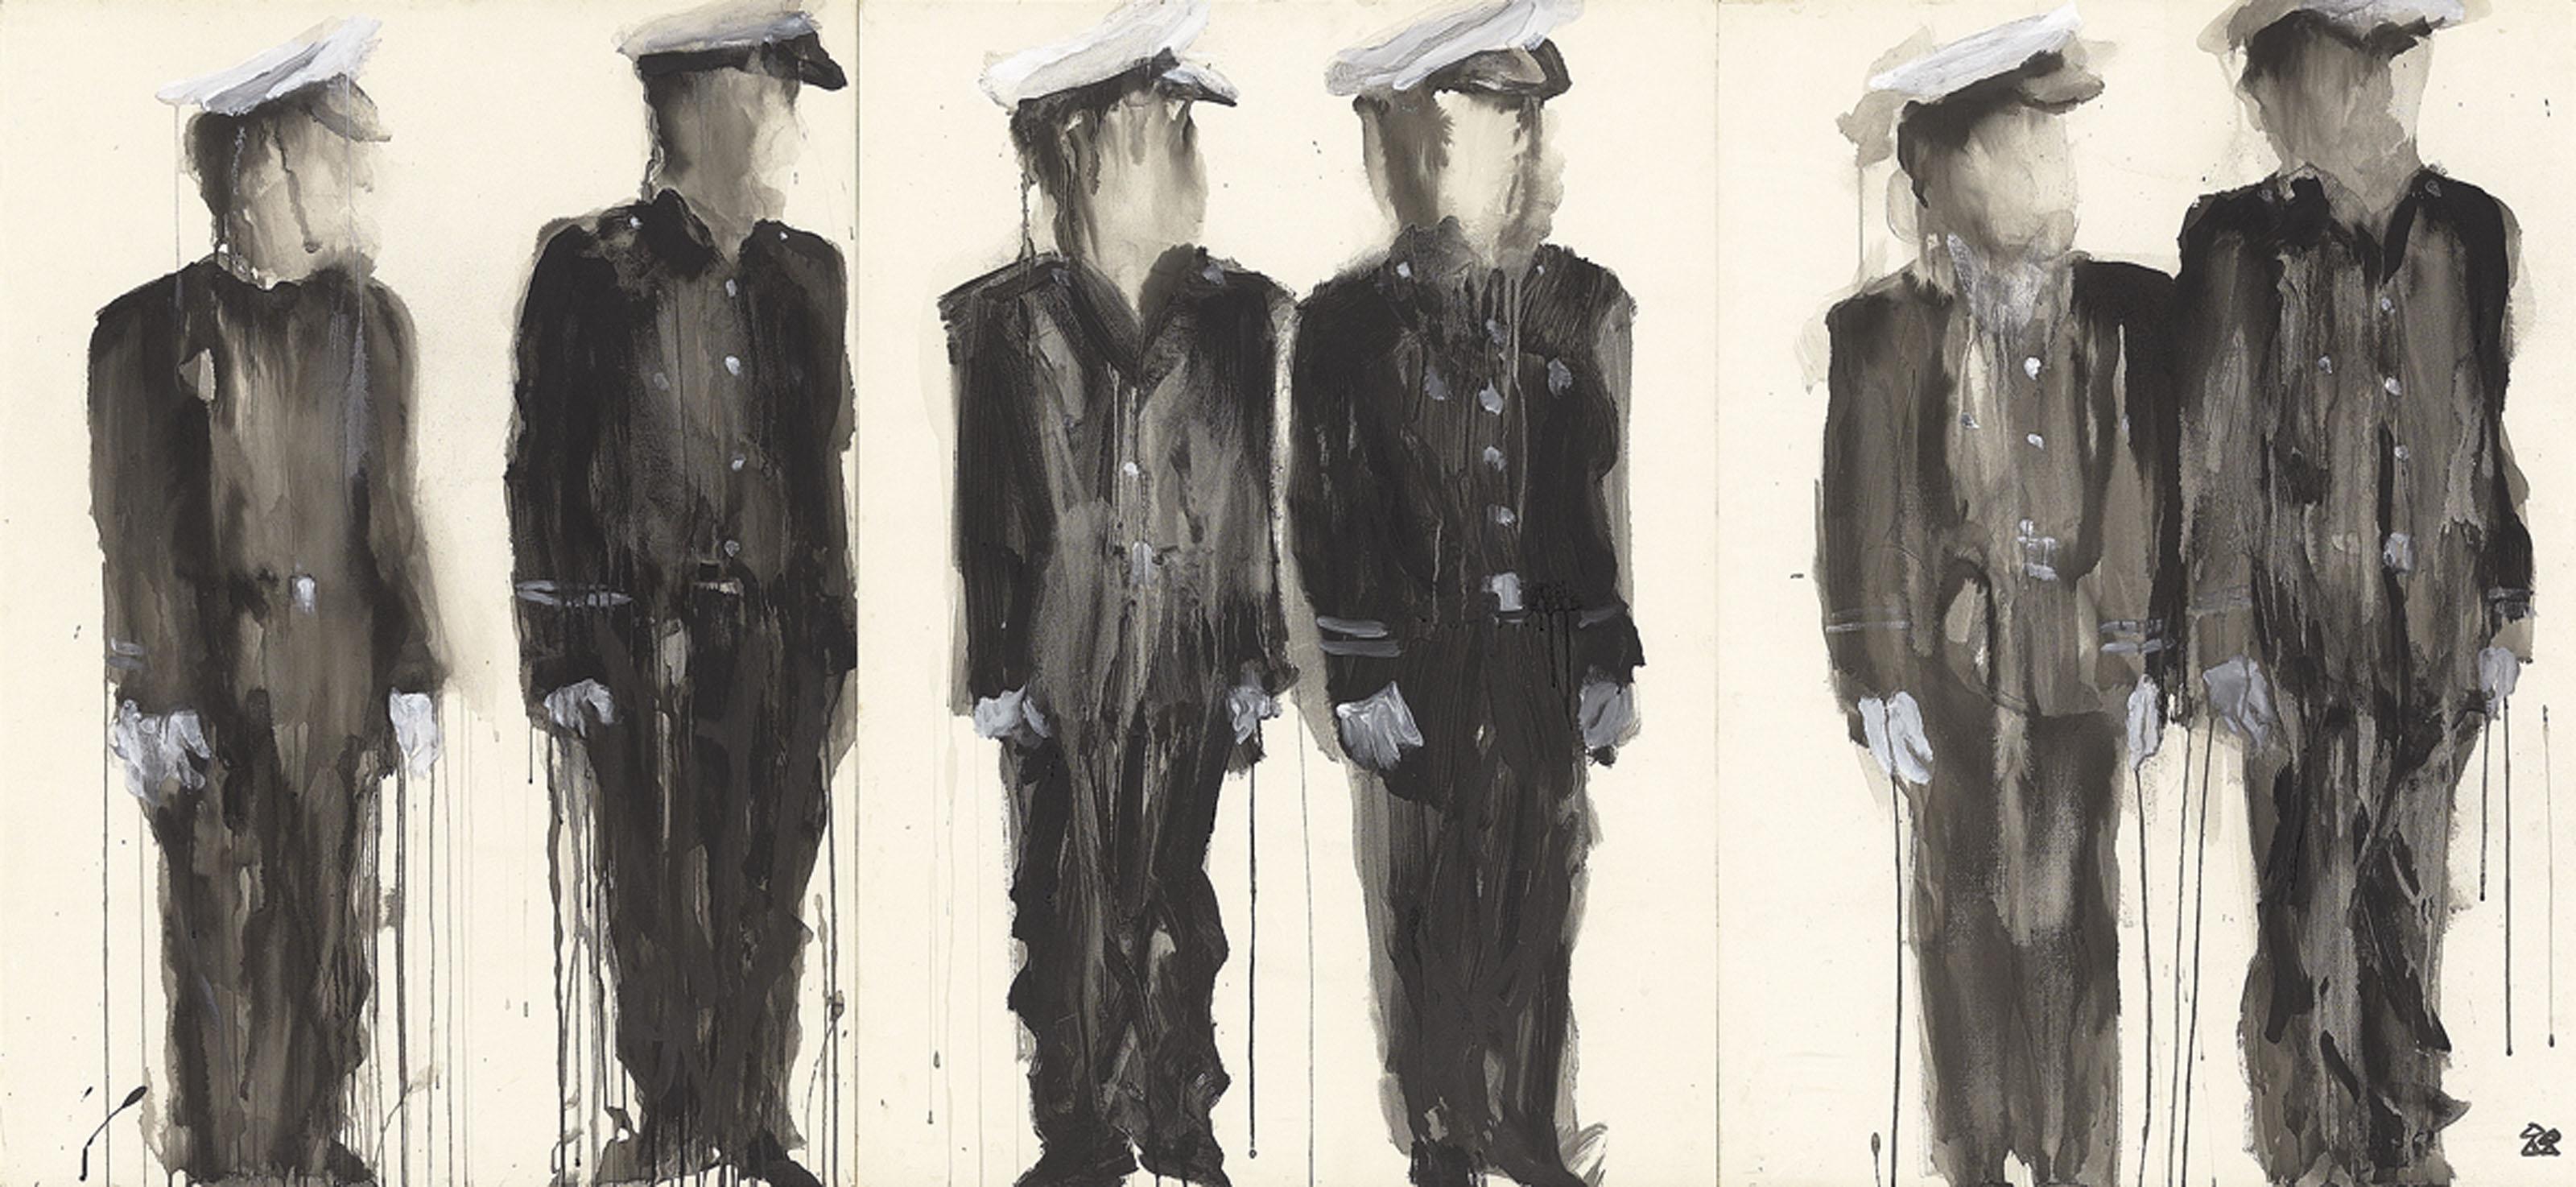 Li Songsong (B. 1968)